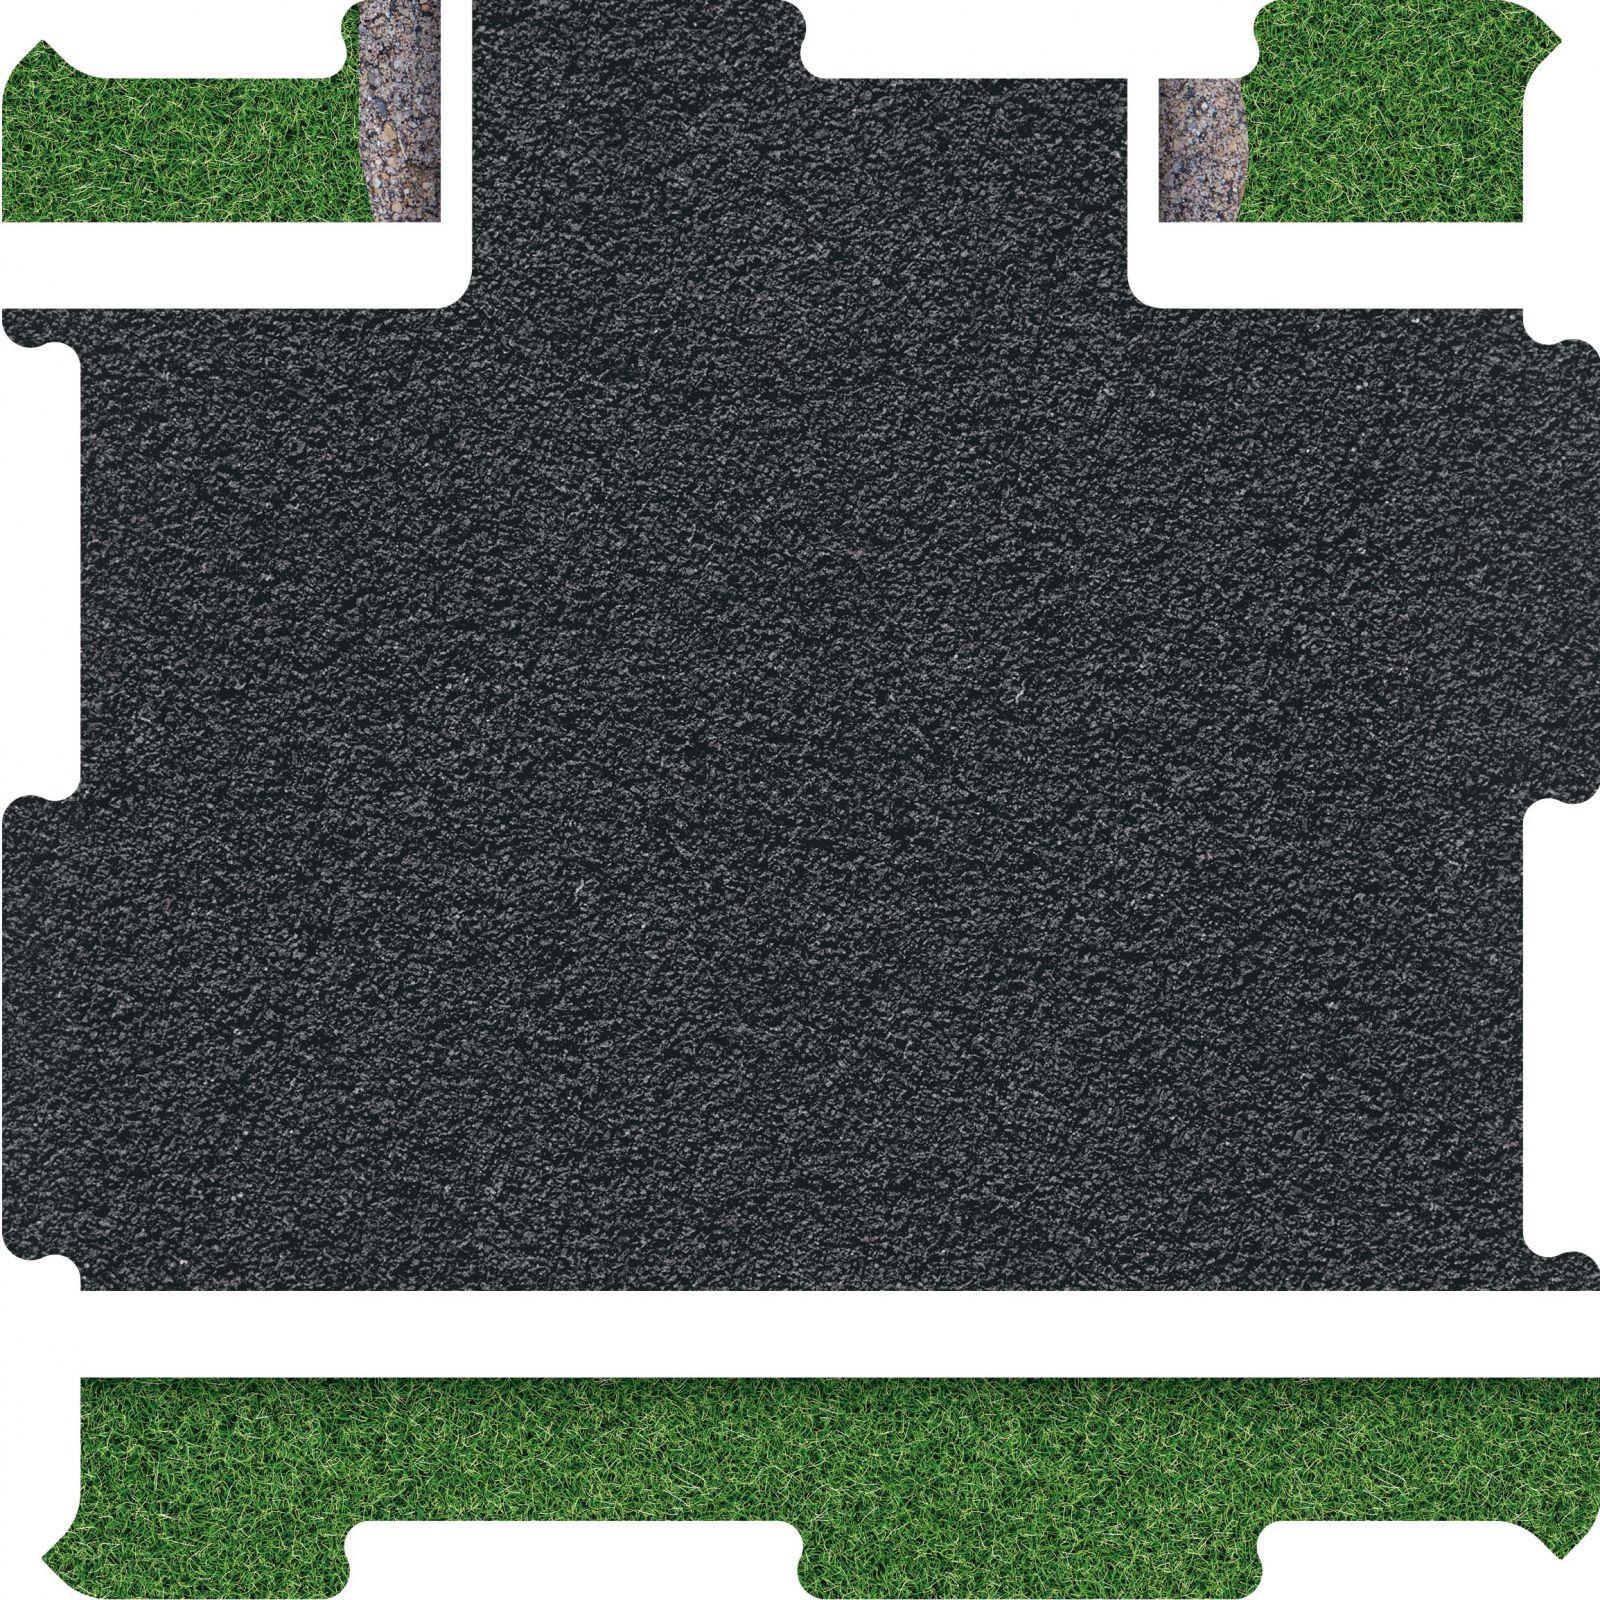 Podlahove puzzle zavodni okruh vyjezd